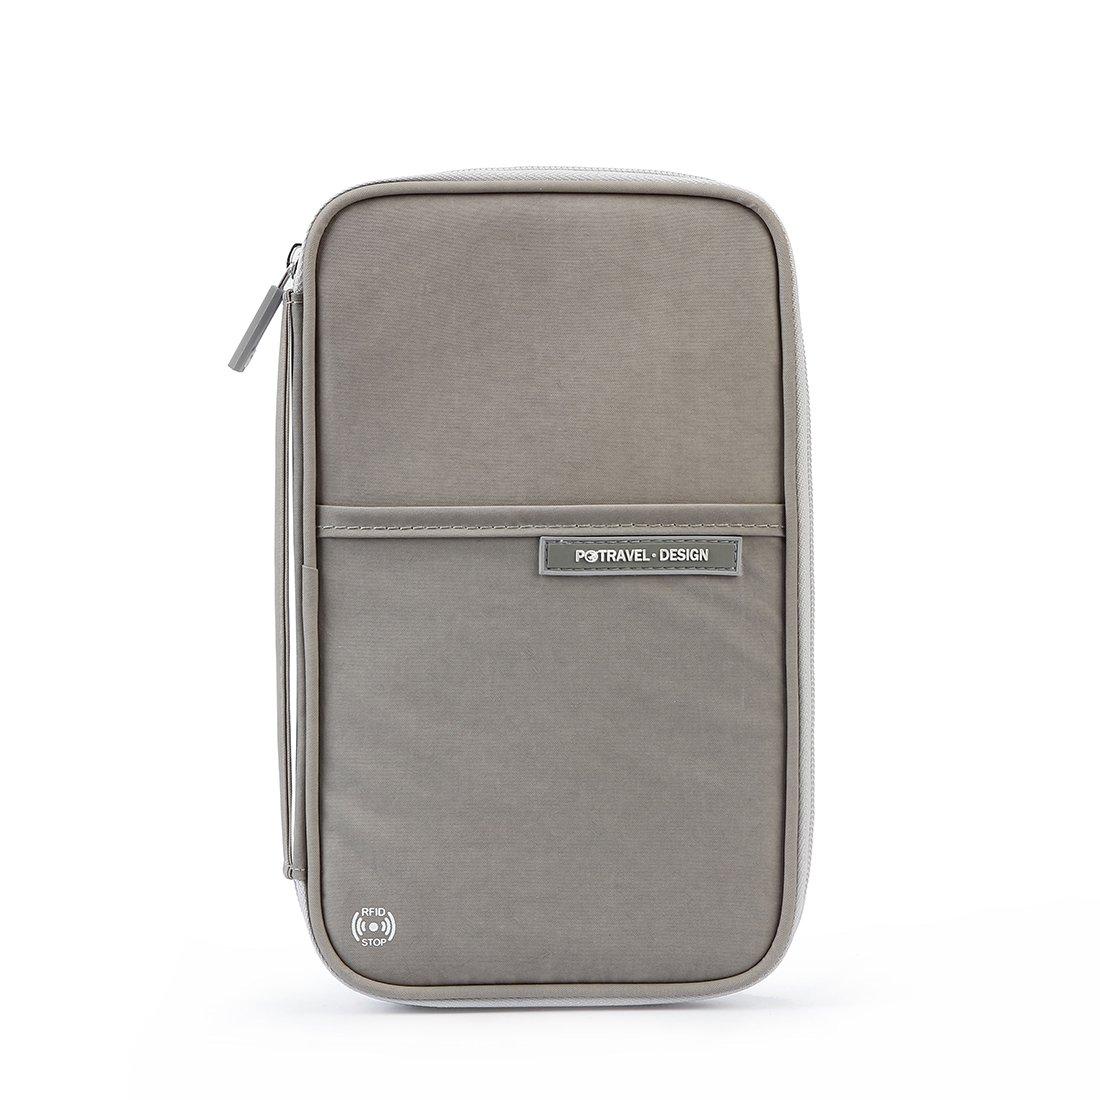 RFID Blocking Travel Passport Wallet Holder,Family Document Organizer Bag